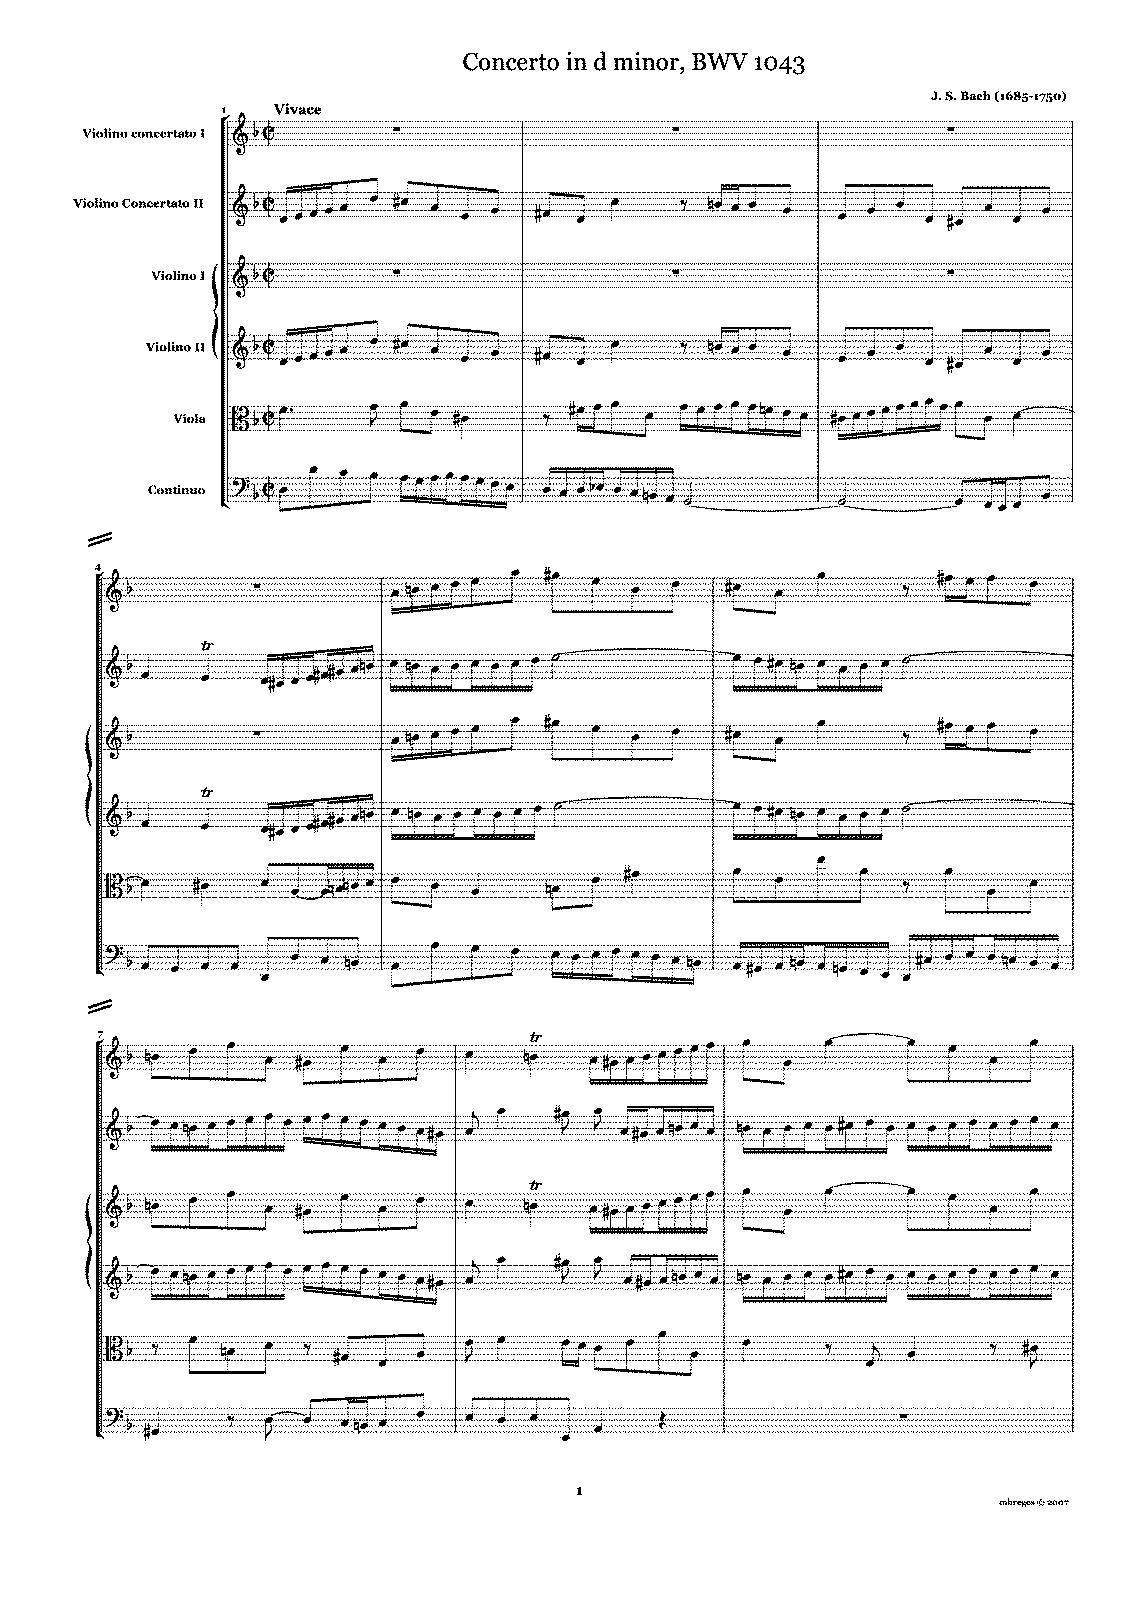 Concerto for 2 Violins in D minor, BWV 1043 (Bach, Johann